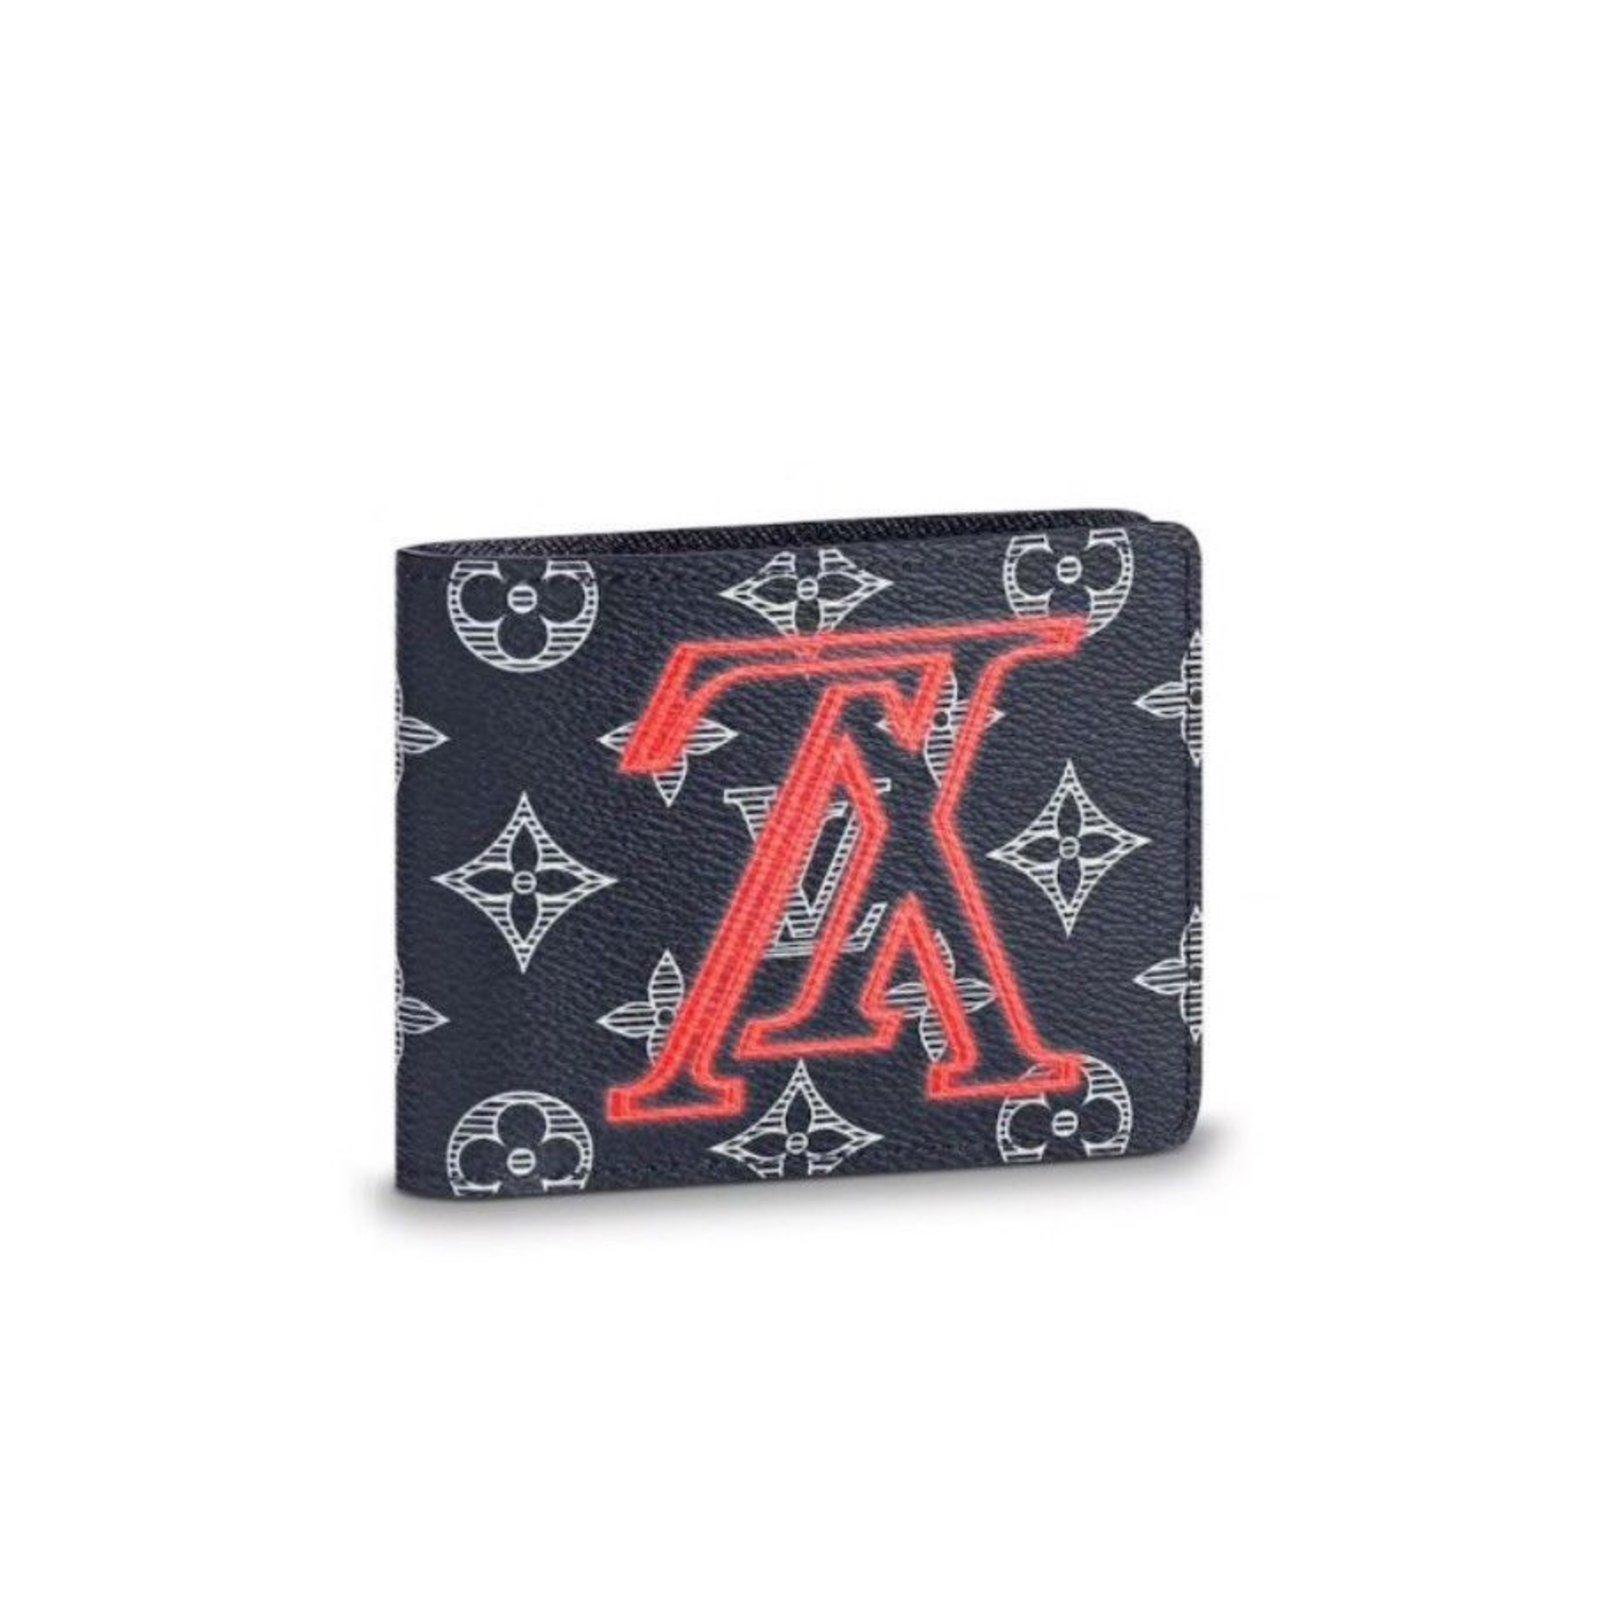 fb4ee0dec81f Louis Vuitton Louis Vuitton mens wallet Wallets Small accessories Leather  Grey ref.68347